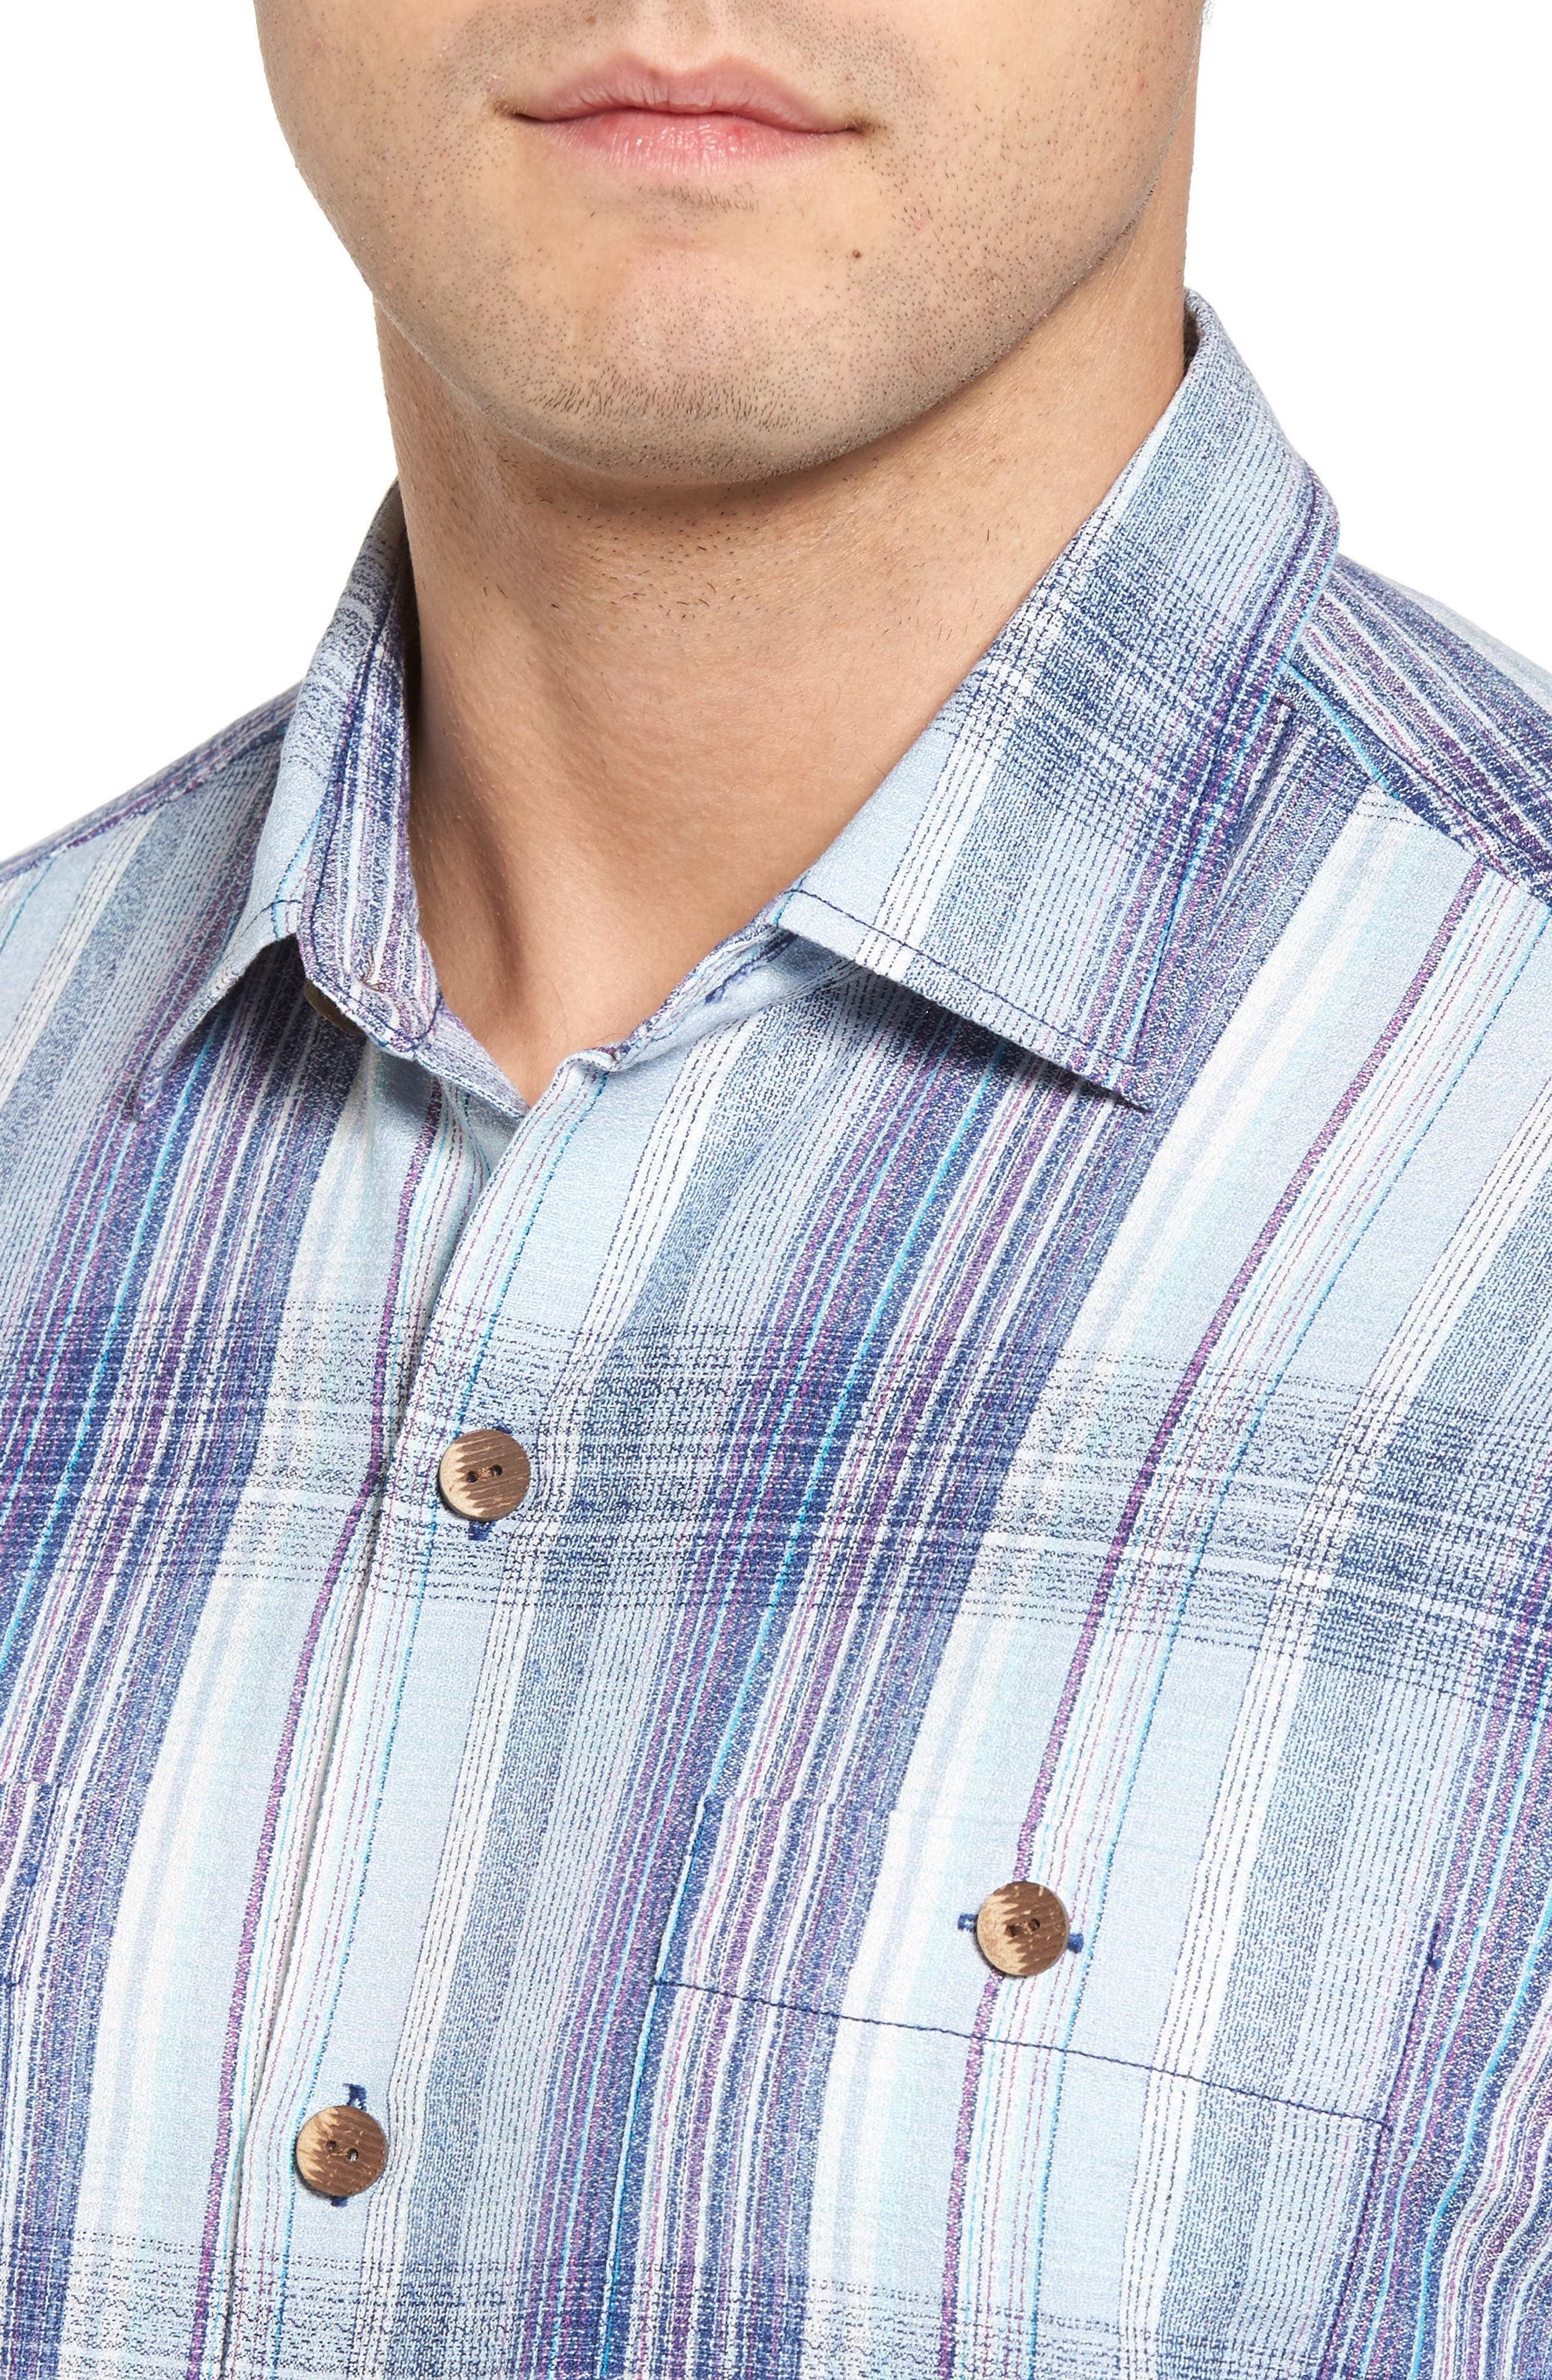 Banyan Cay Regular Fit Silk Blend Sport Shirt,                             Alternate thumbnail 4, color,                             Dockside Blue